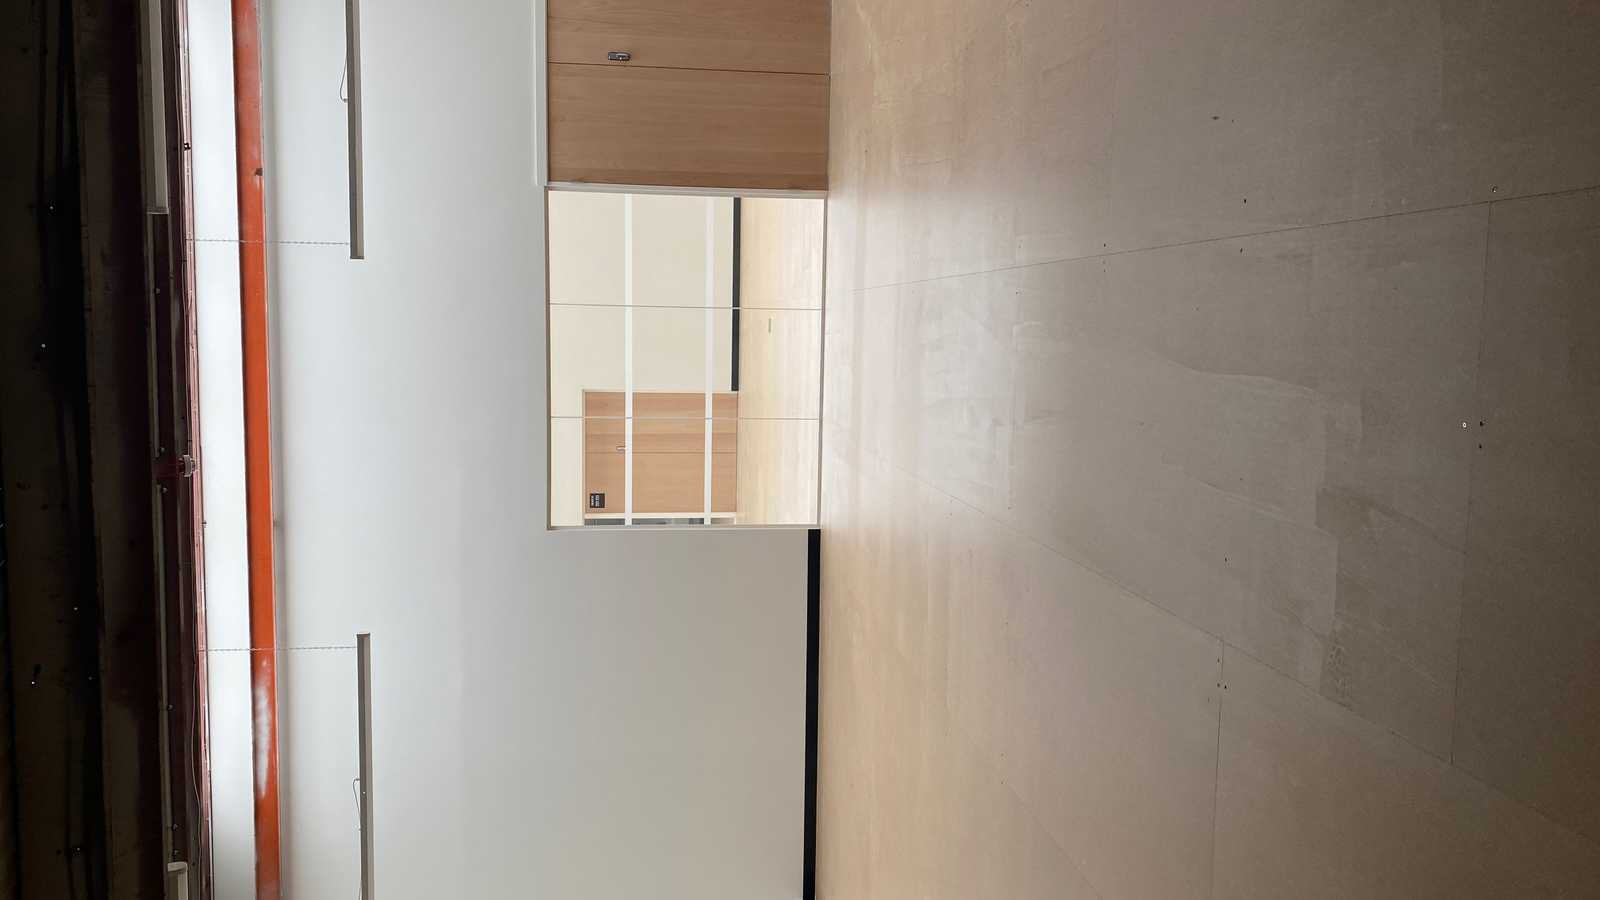 Creative Space -203/204 - Oxgate House - Brent Cross